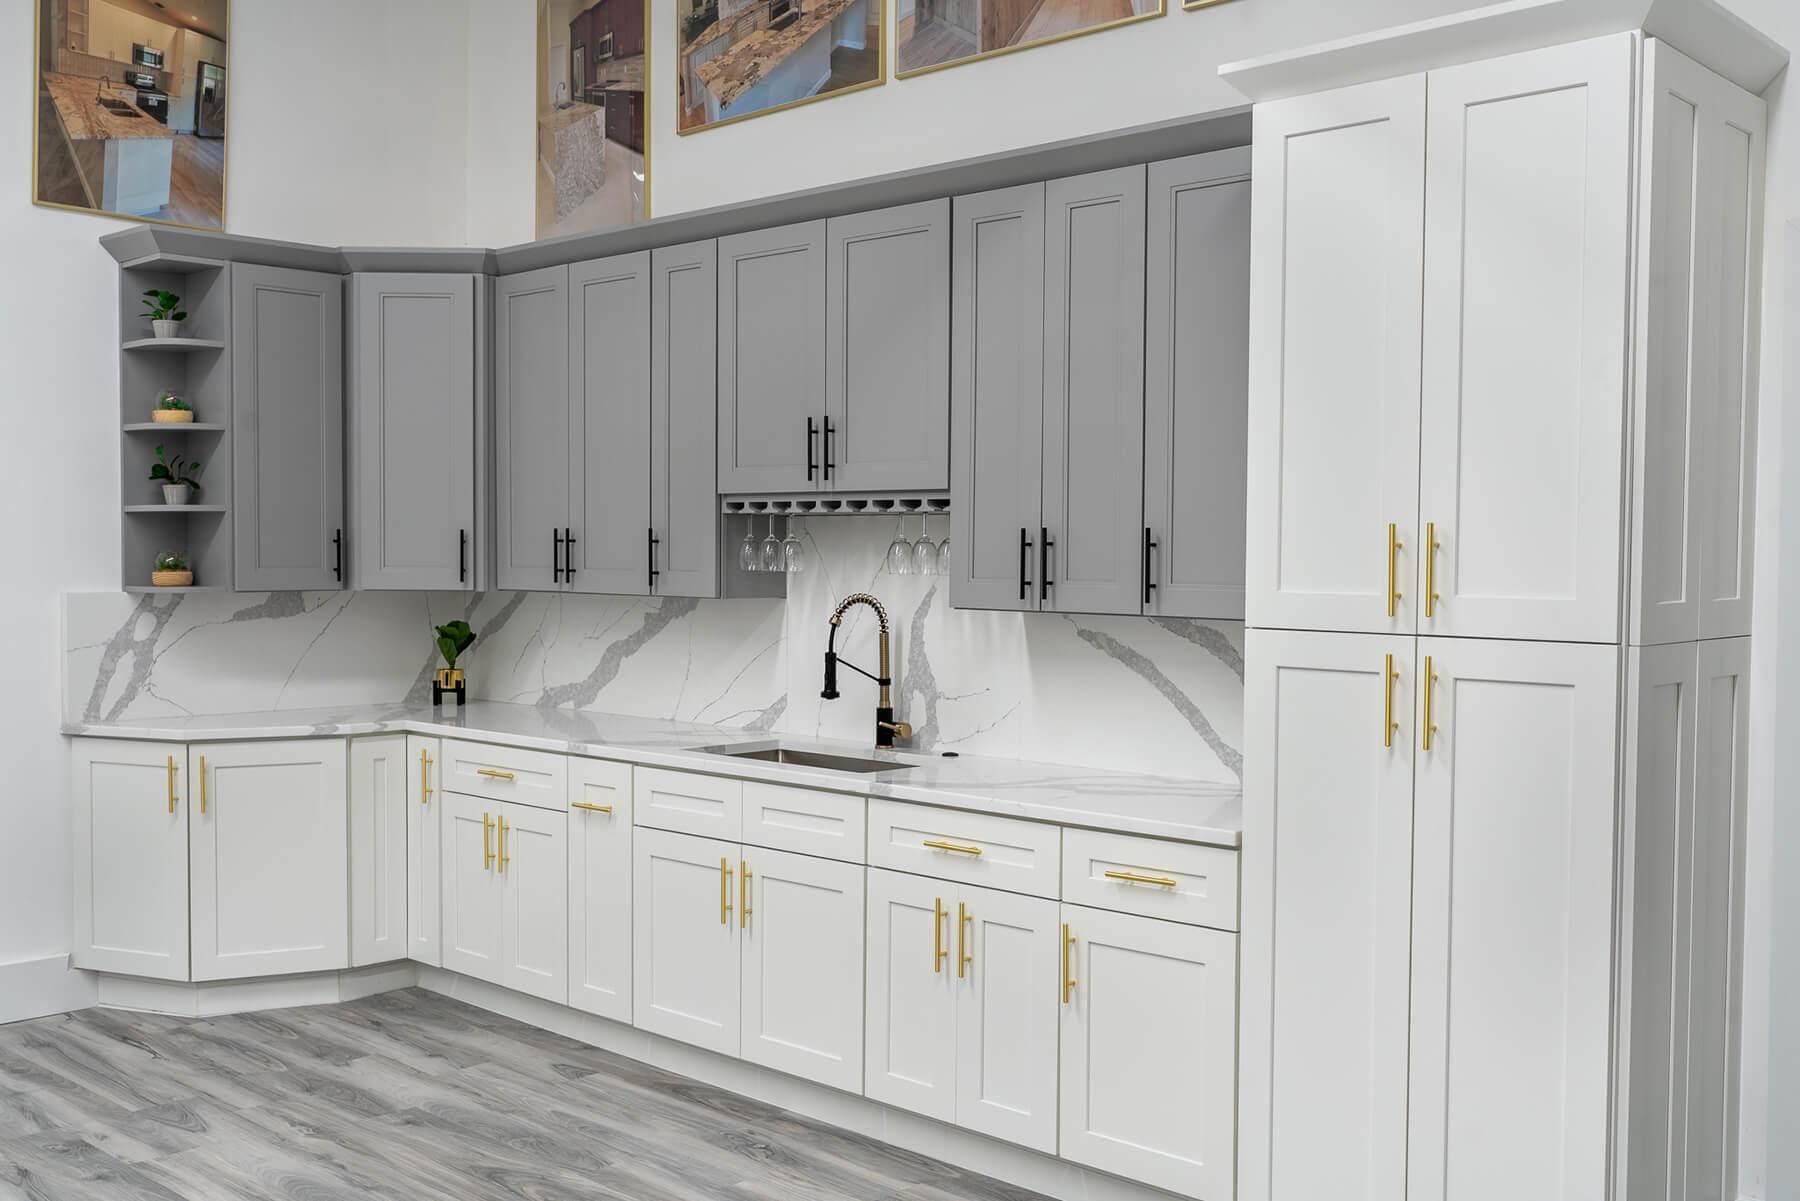 Kitchen Design Showroom In South FLorida